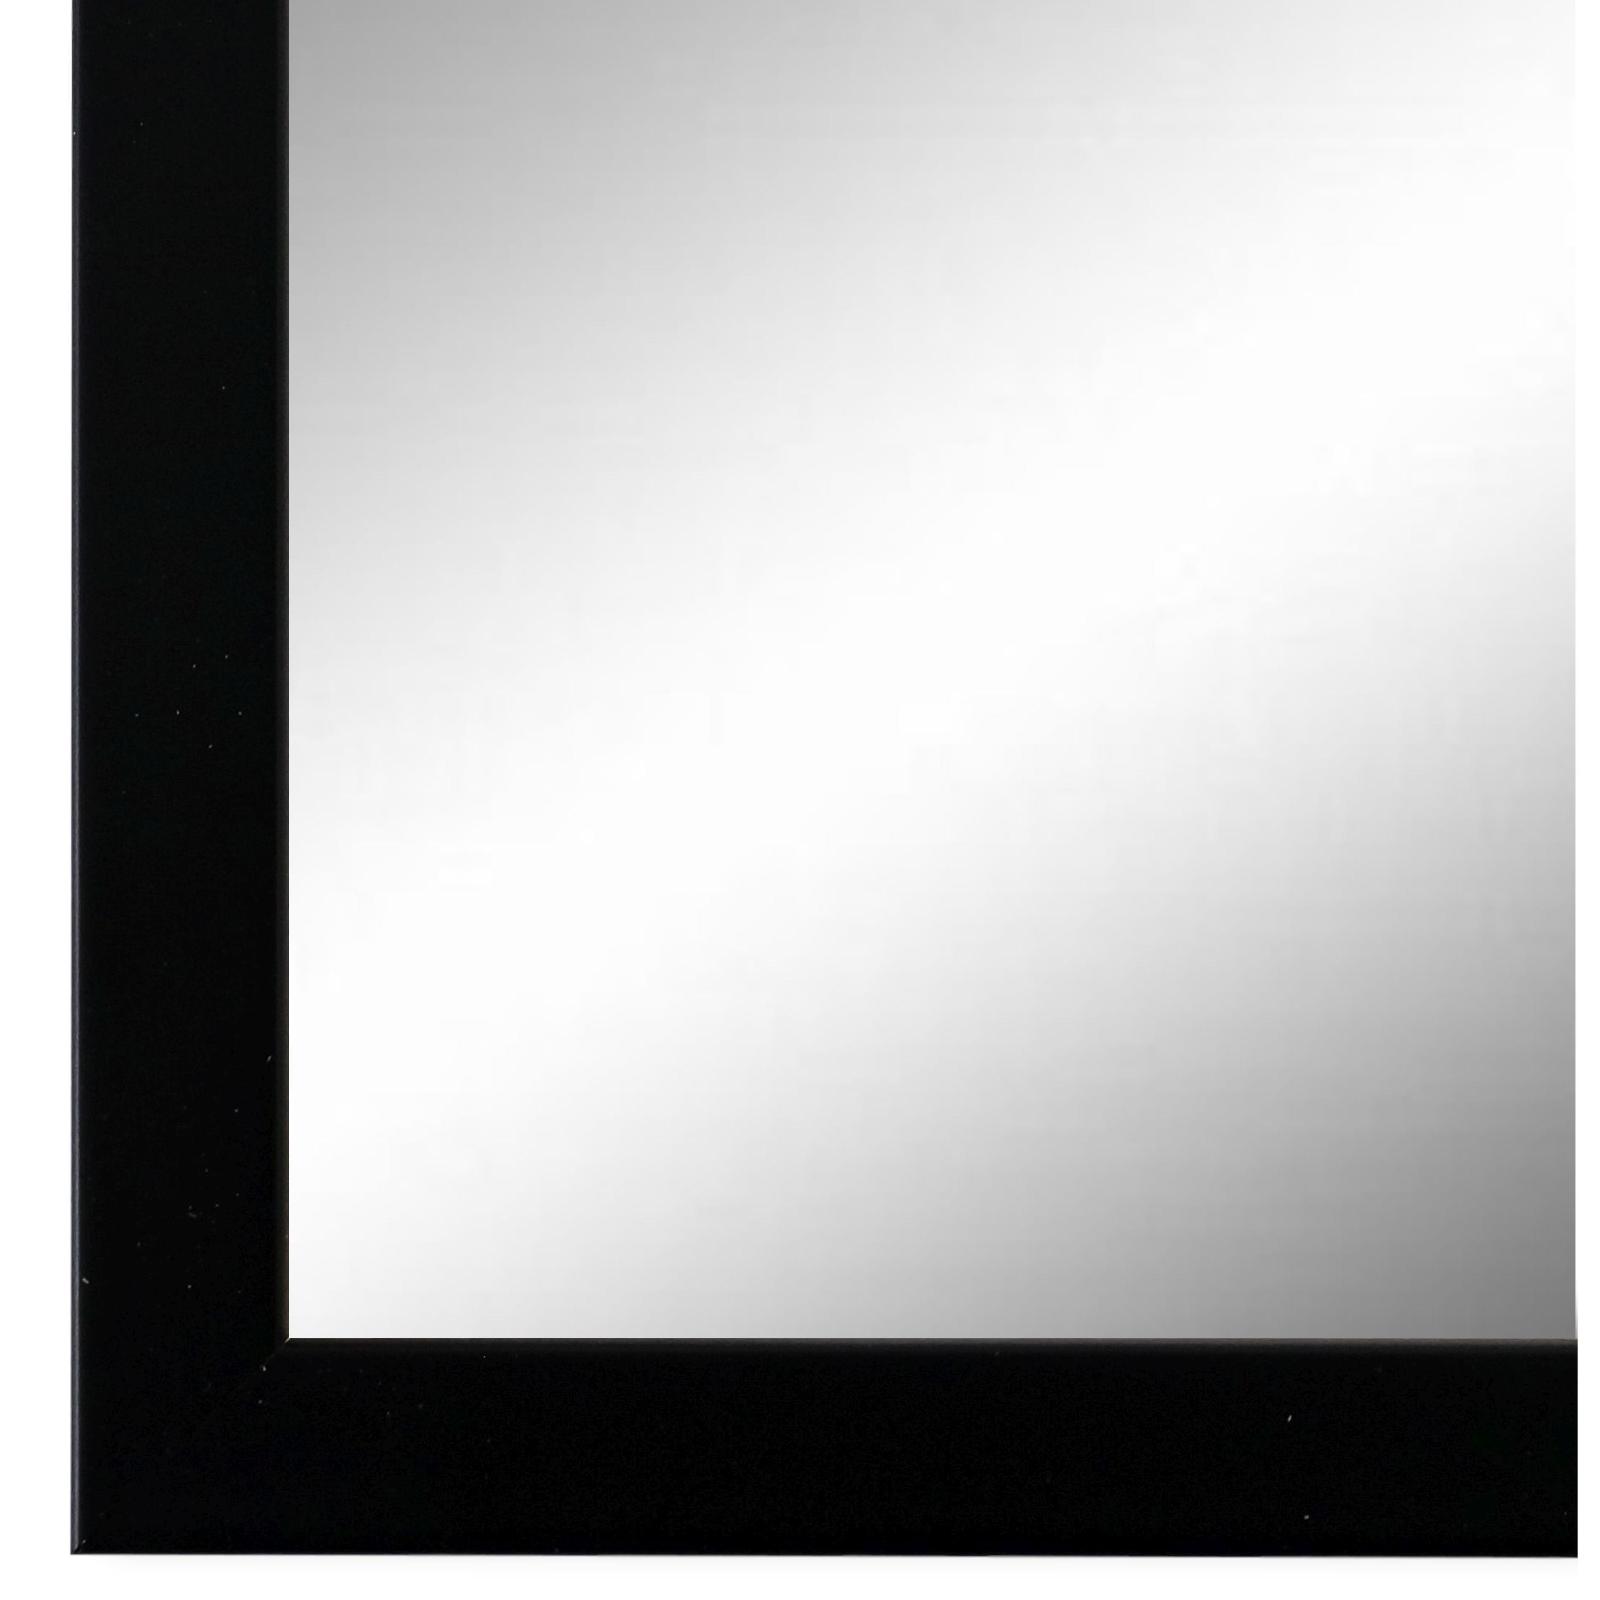 Spiegel Wandspiegel Flurspiegel Badspiegel Schwarz Modern Holz Asti 1,7 - NEU